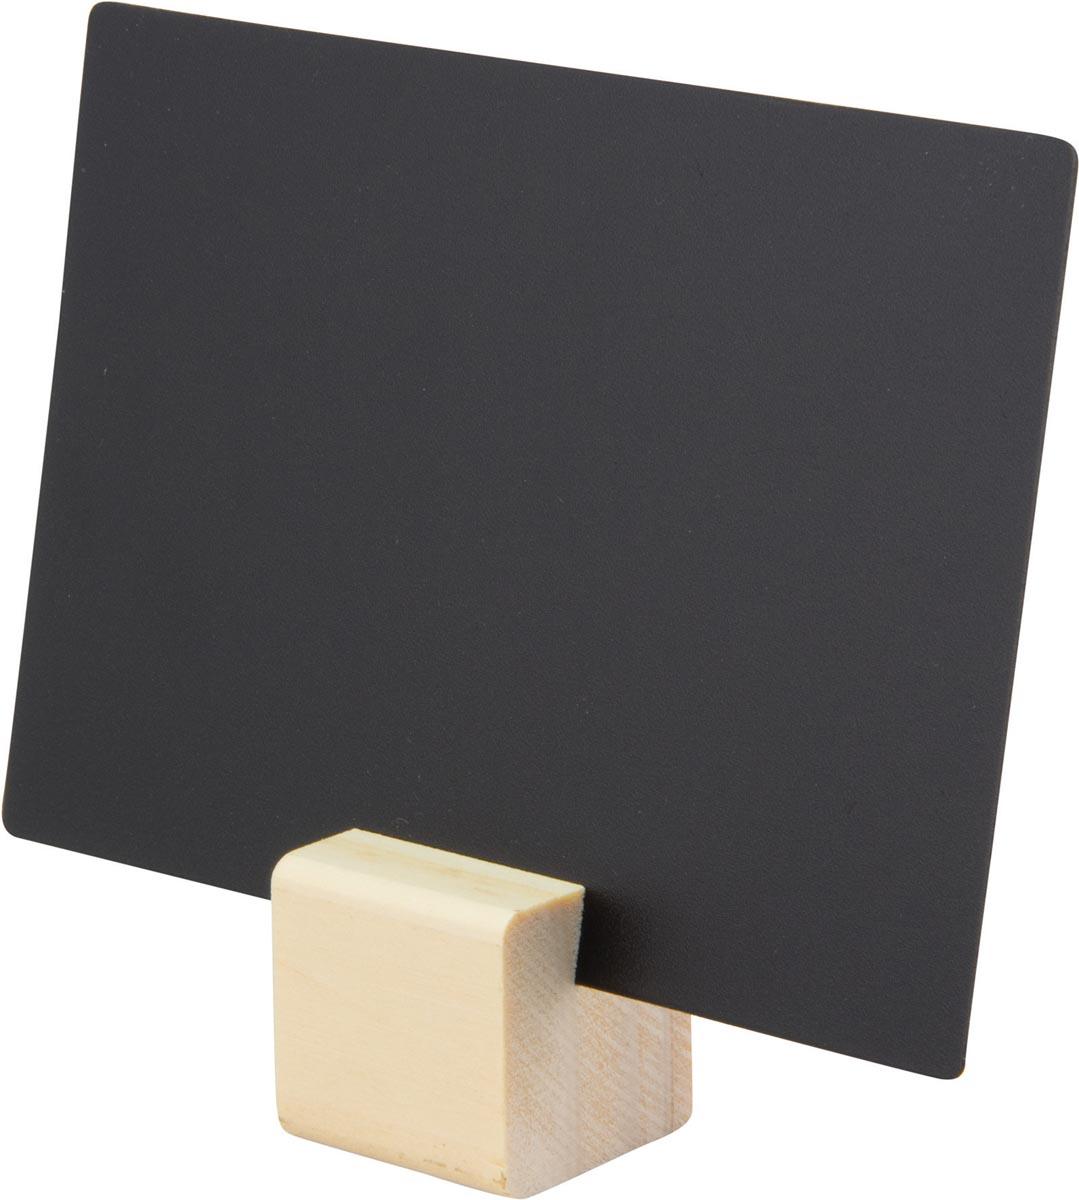 Securit krijtbordjes met teak houder, set van 6 stuks